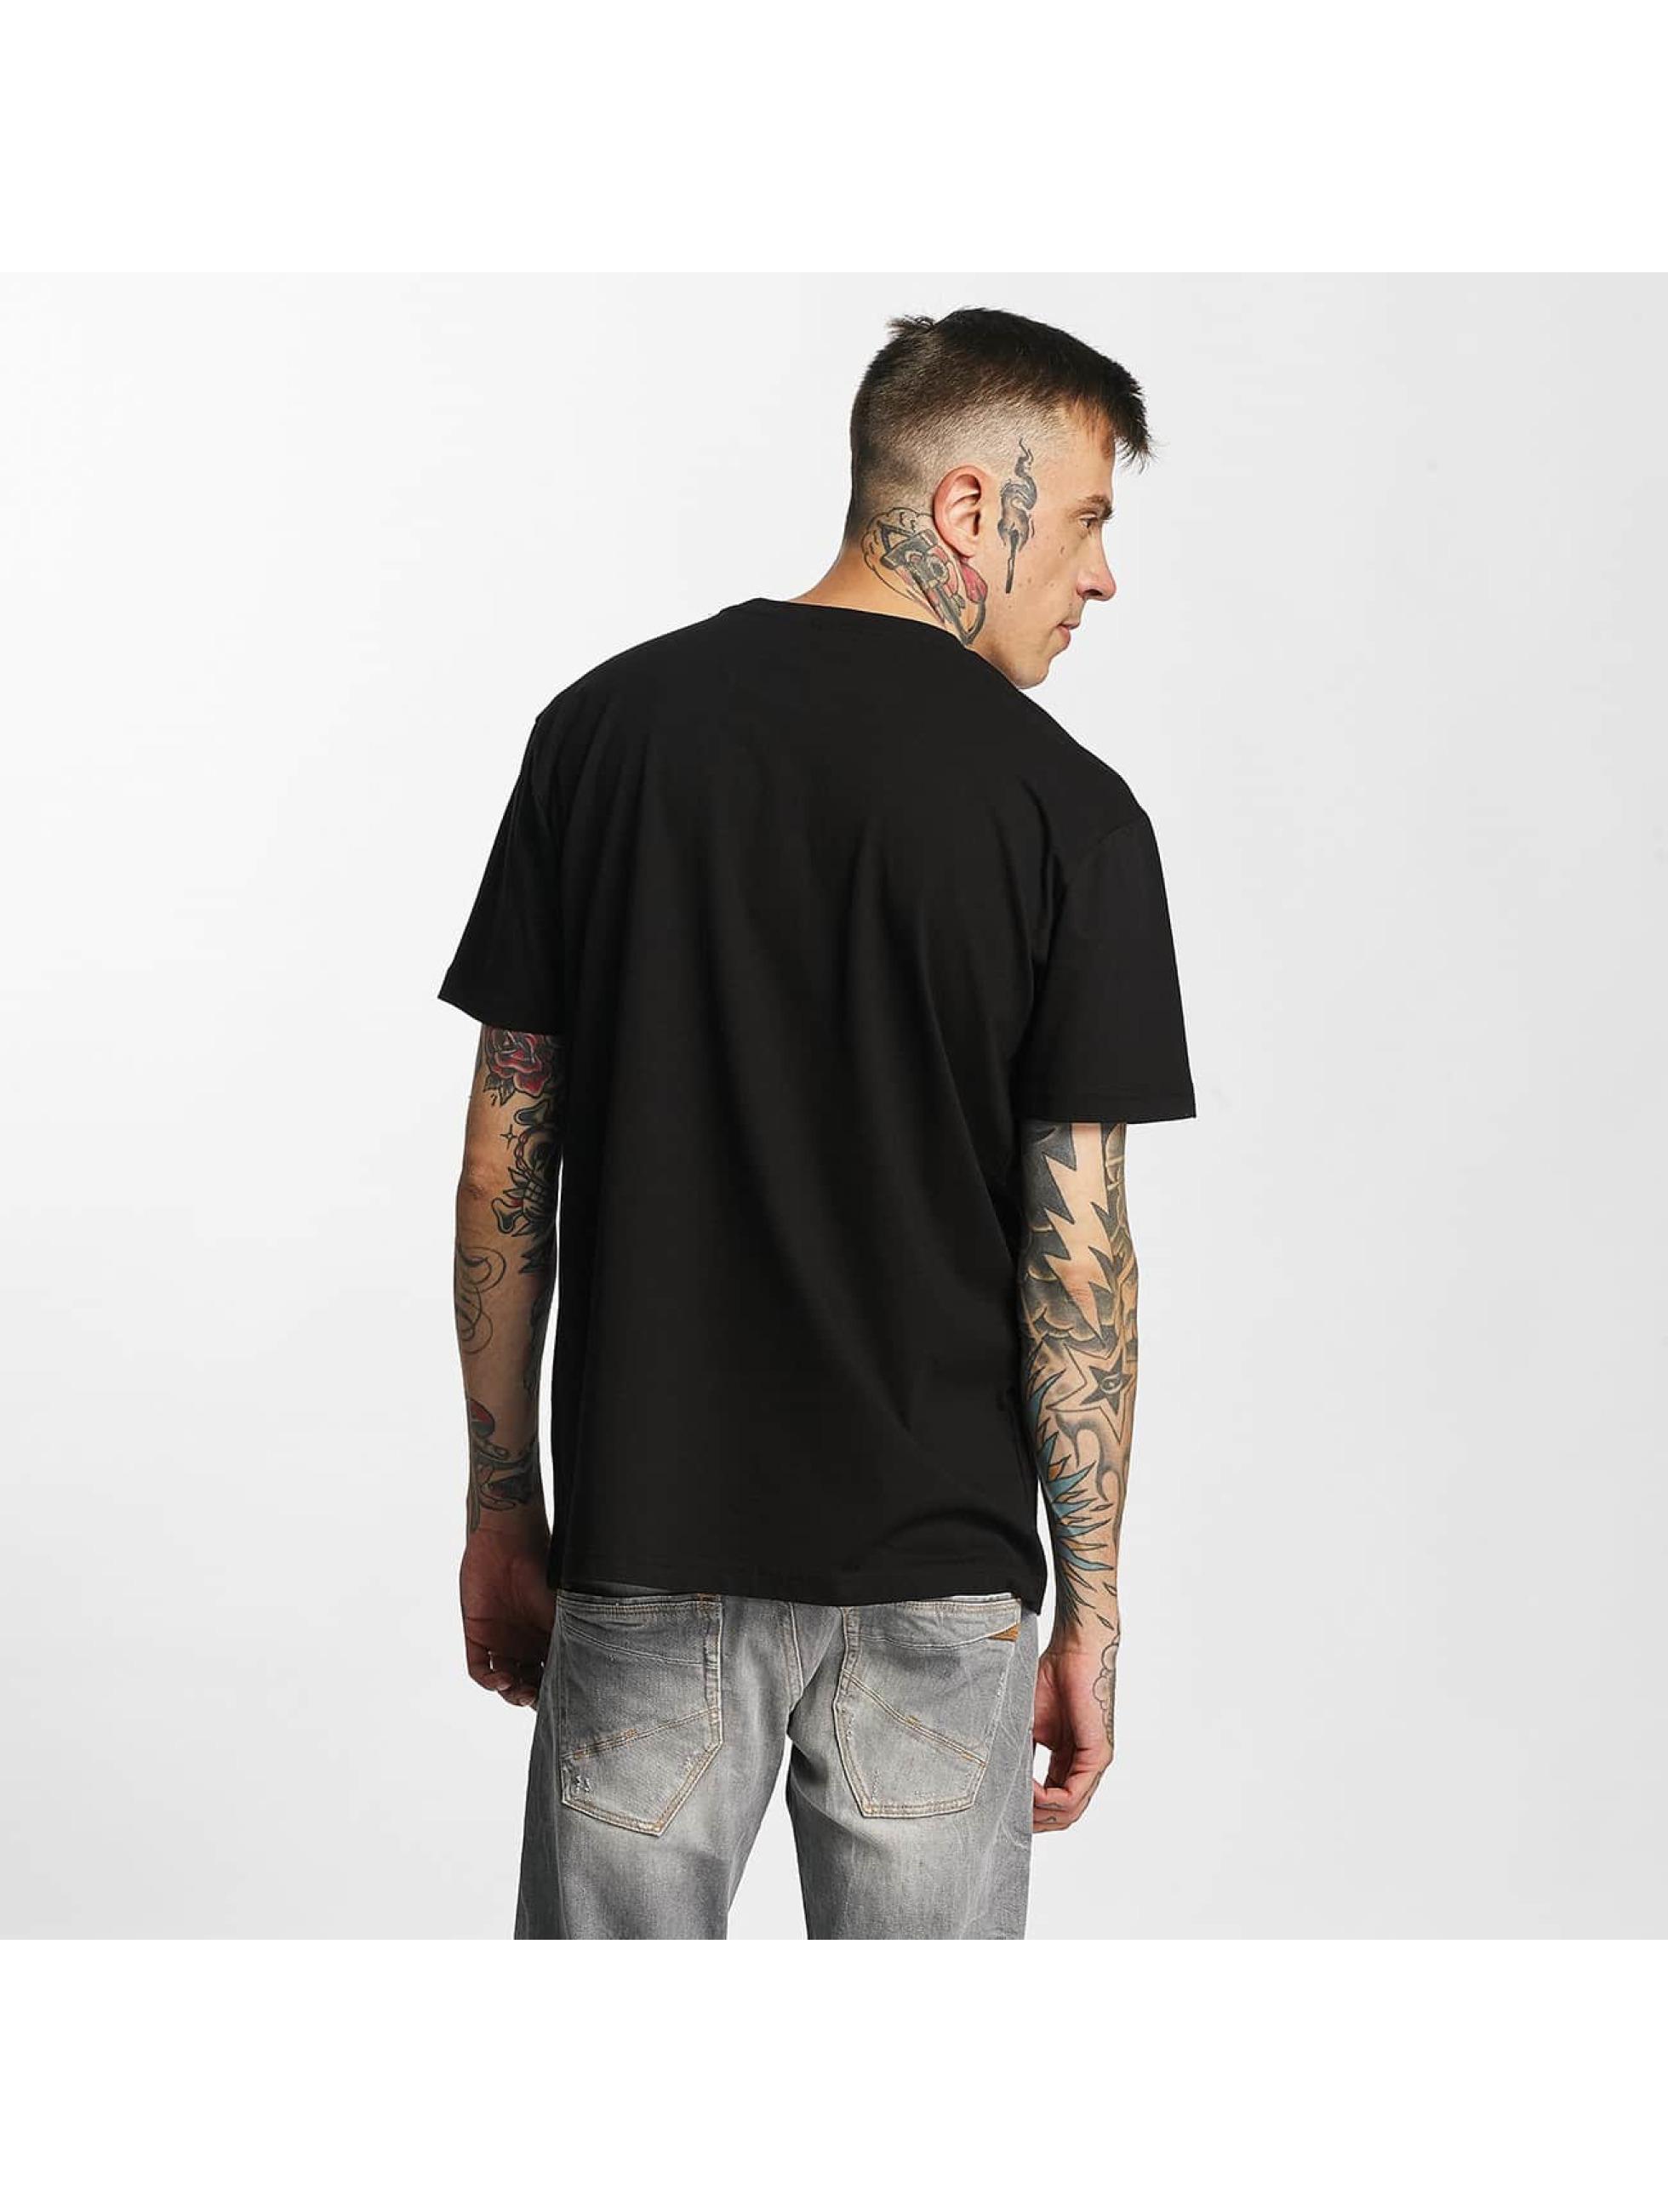 Amplified T-Shirt Snoop Dogg - Dogfather schwarz